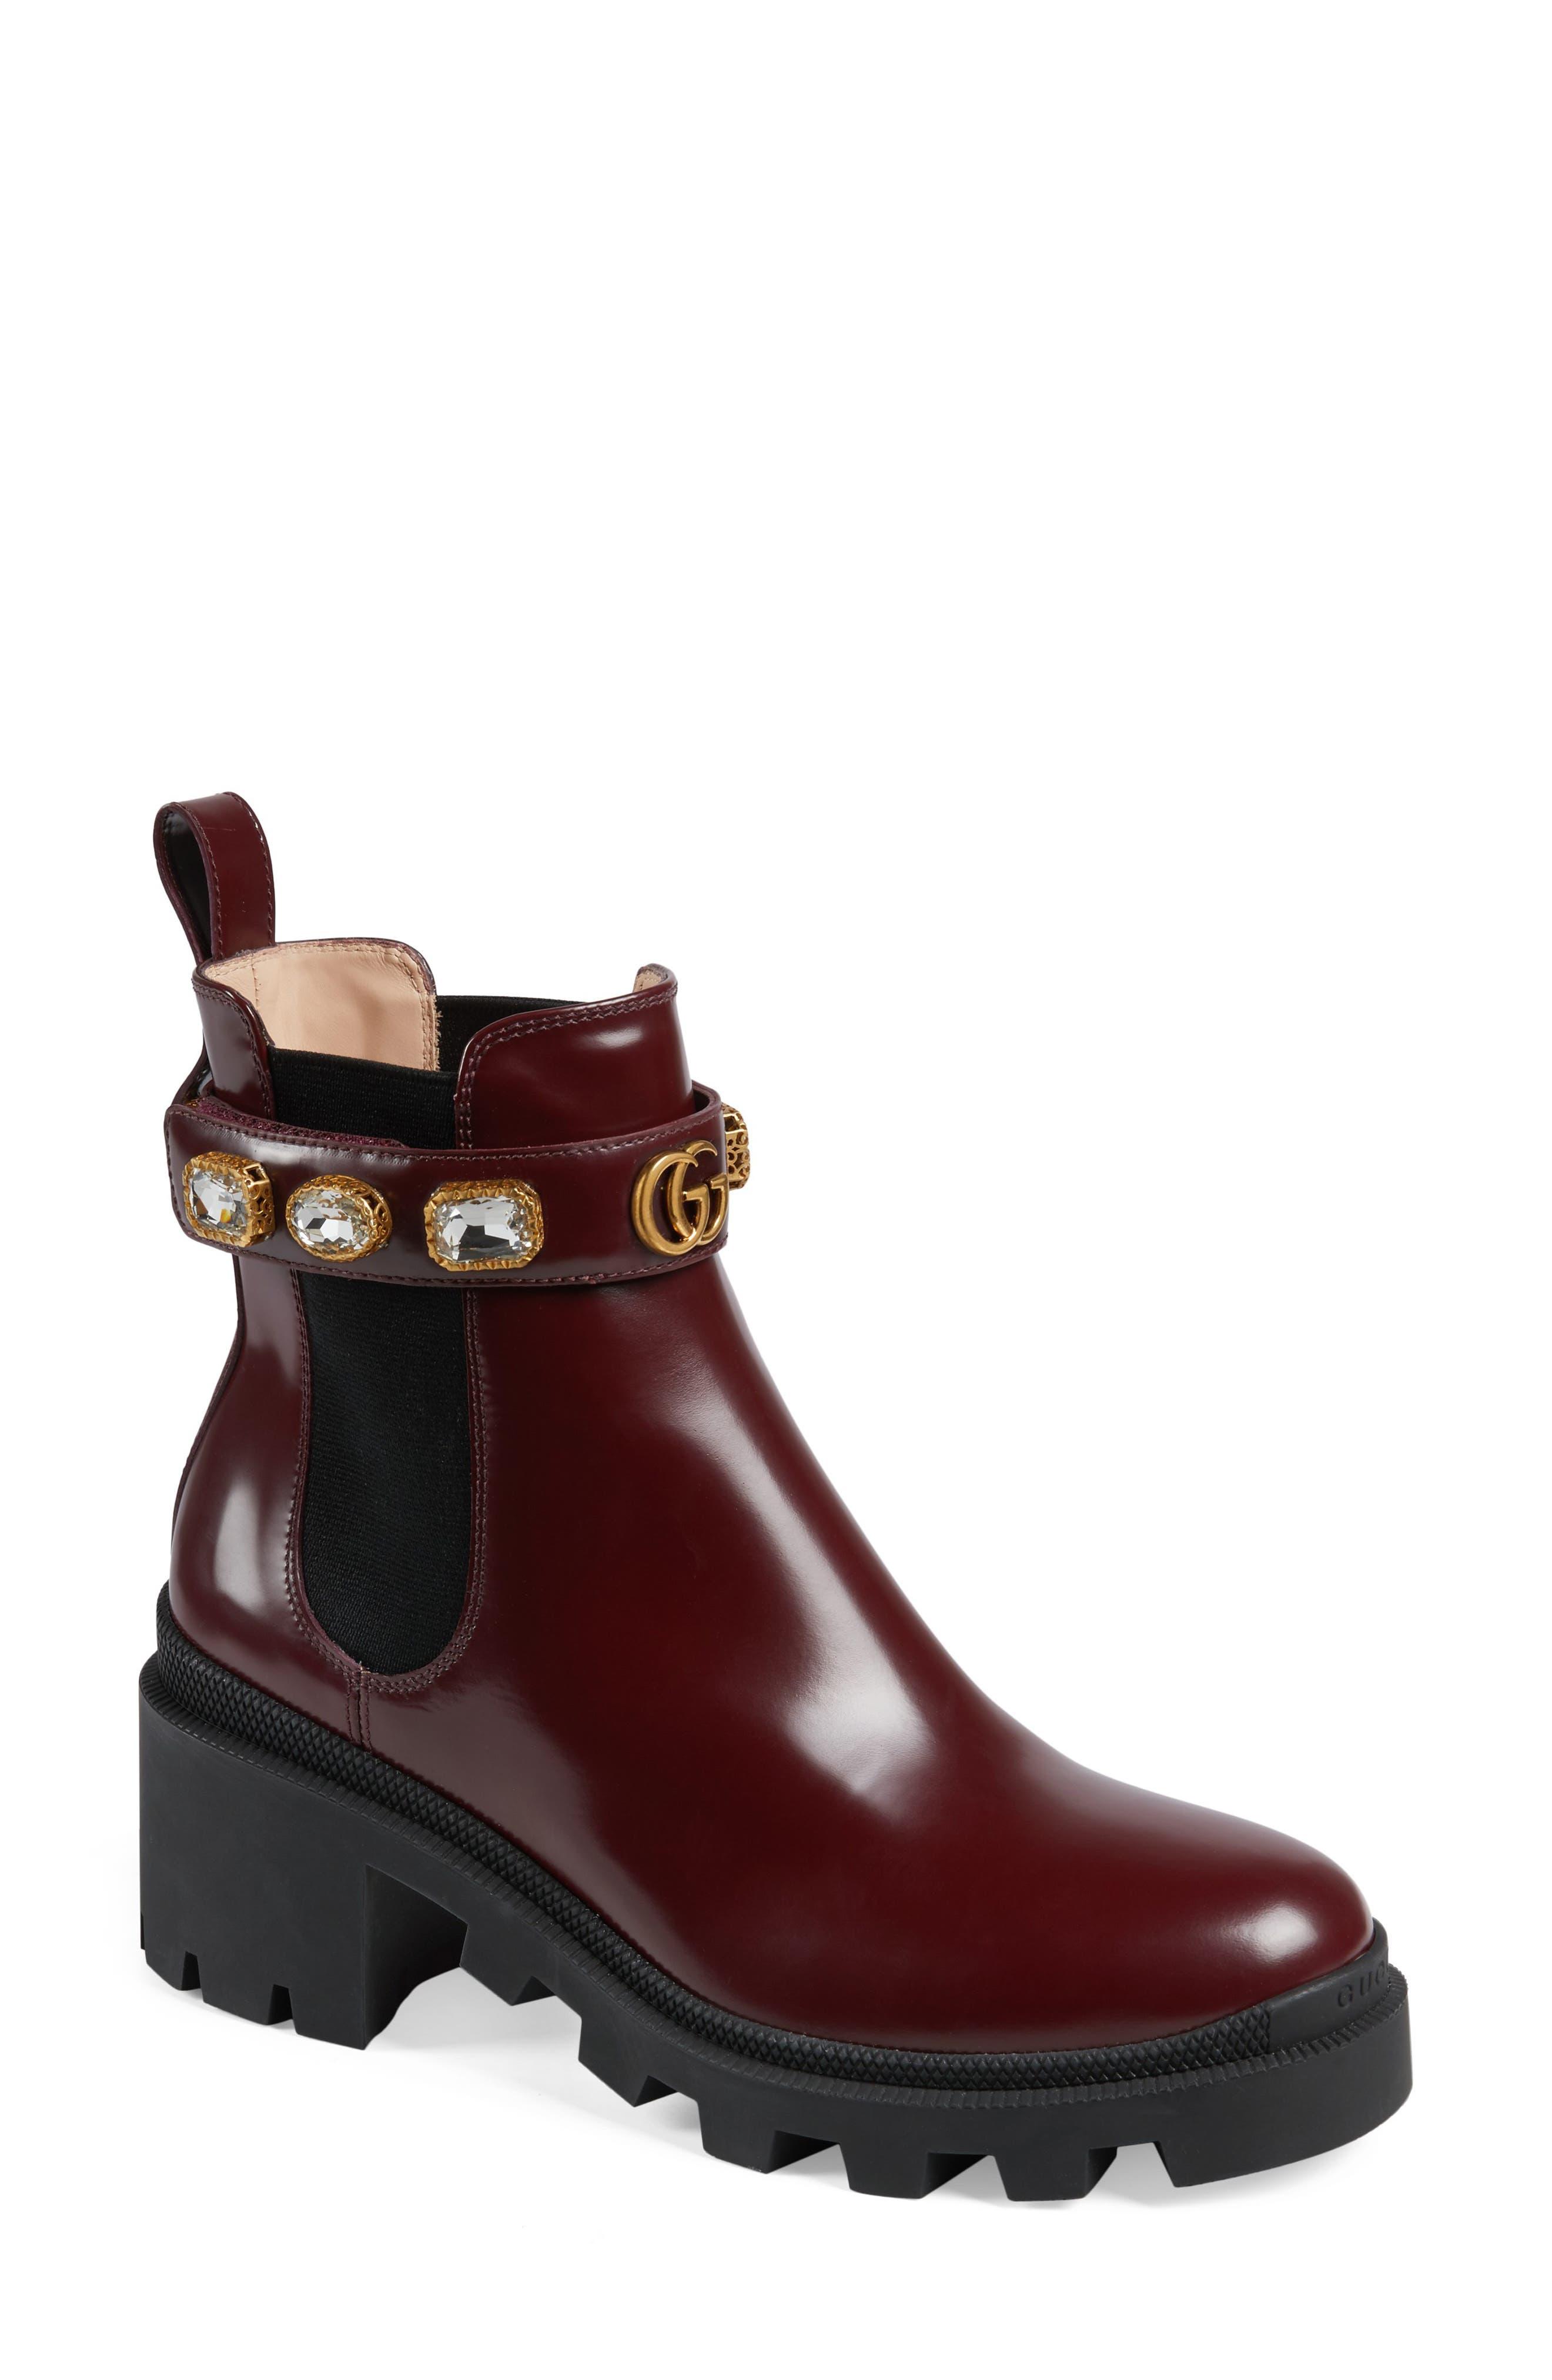 gucci slippers women's sale